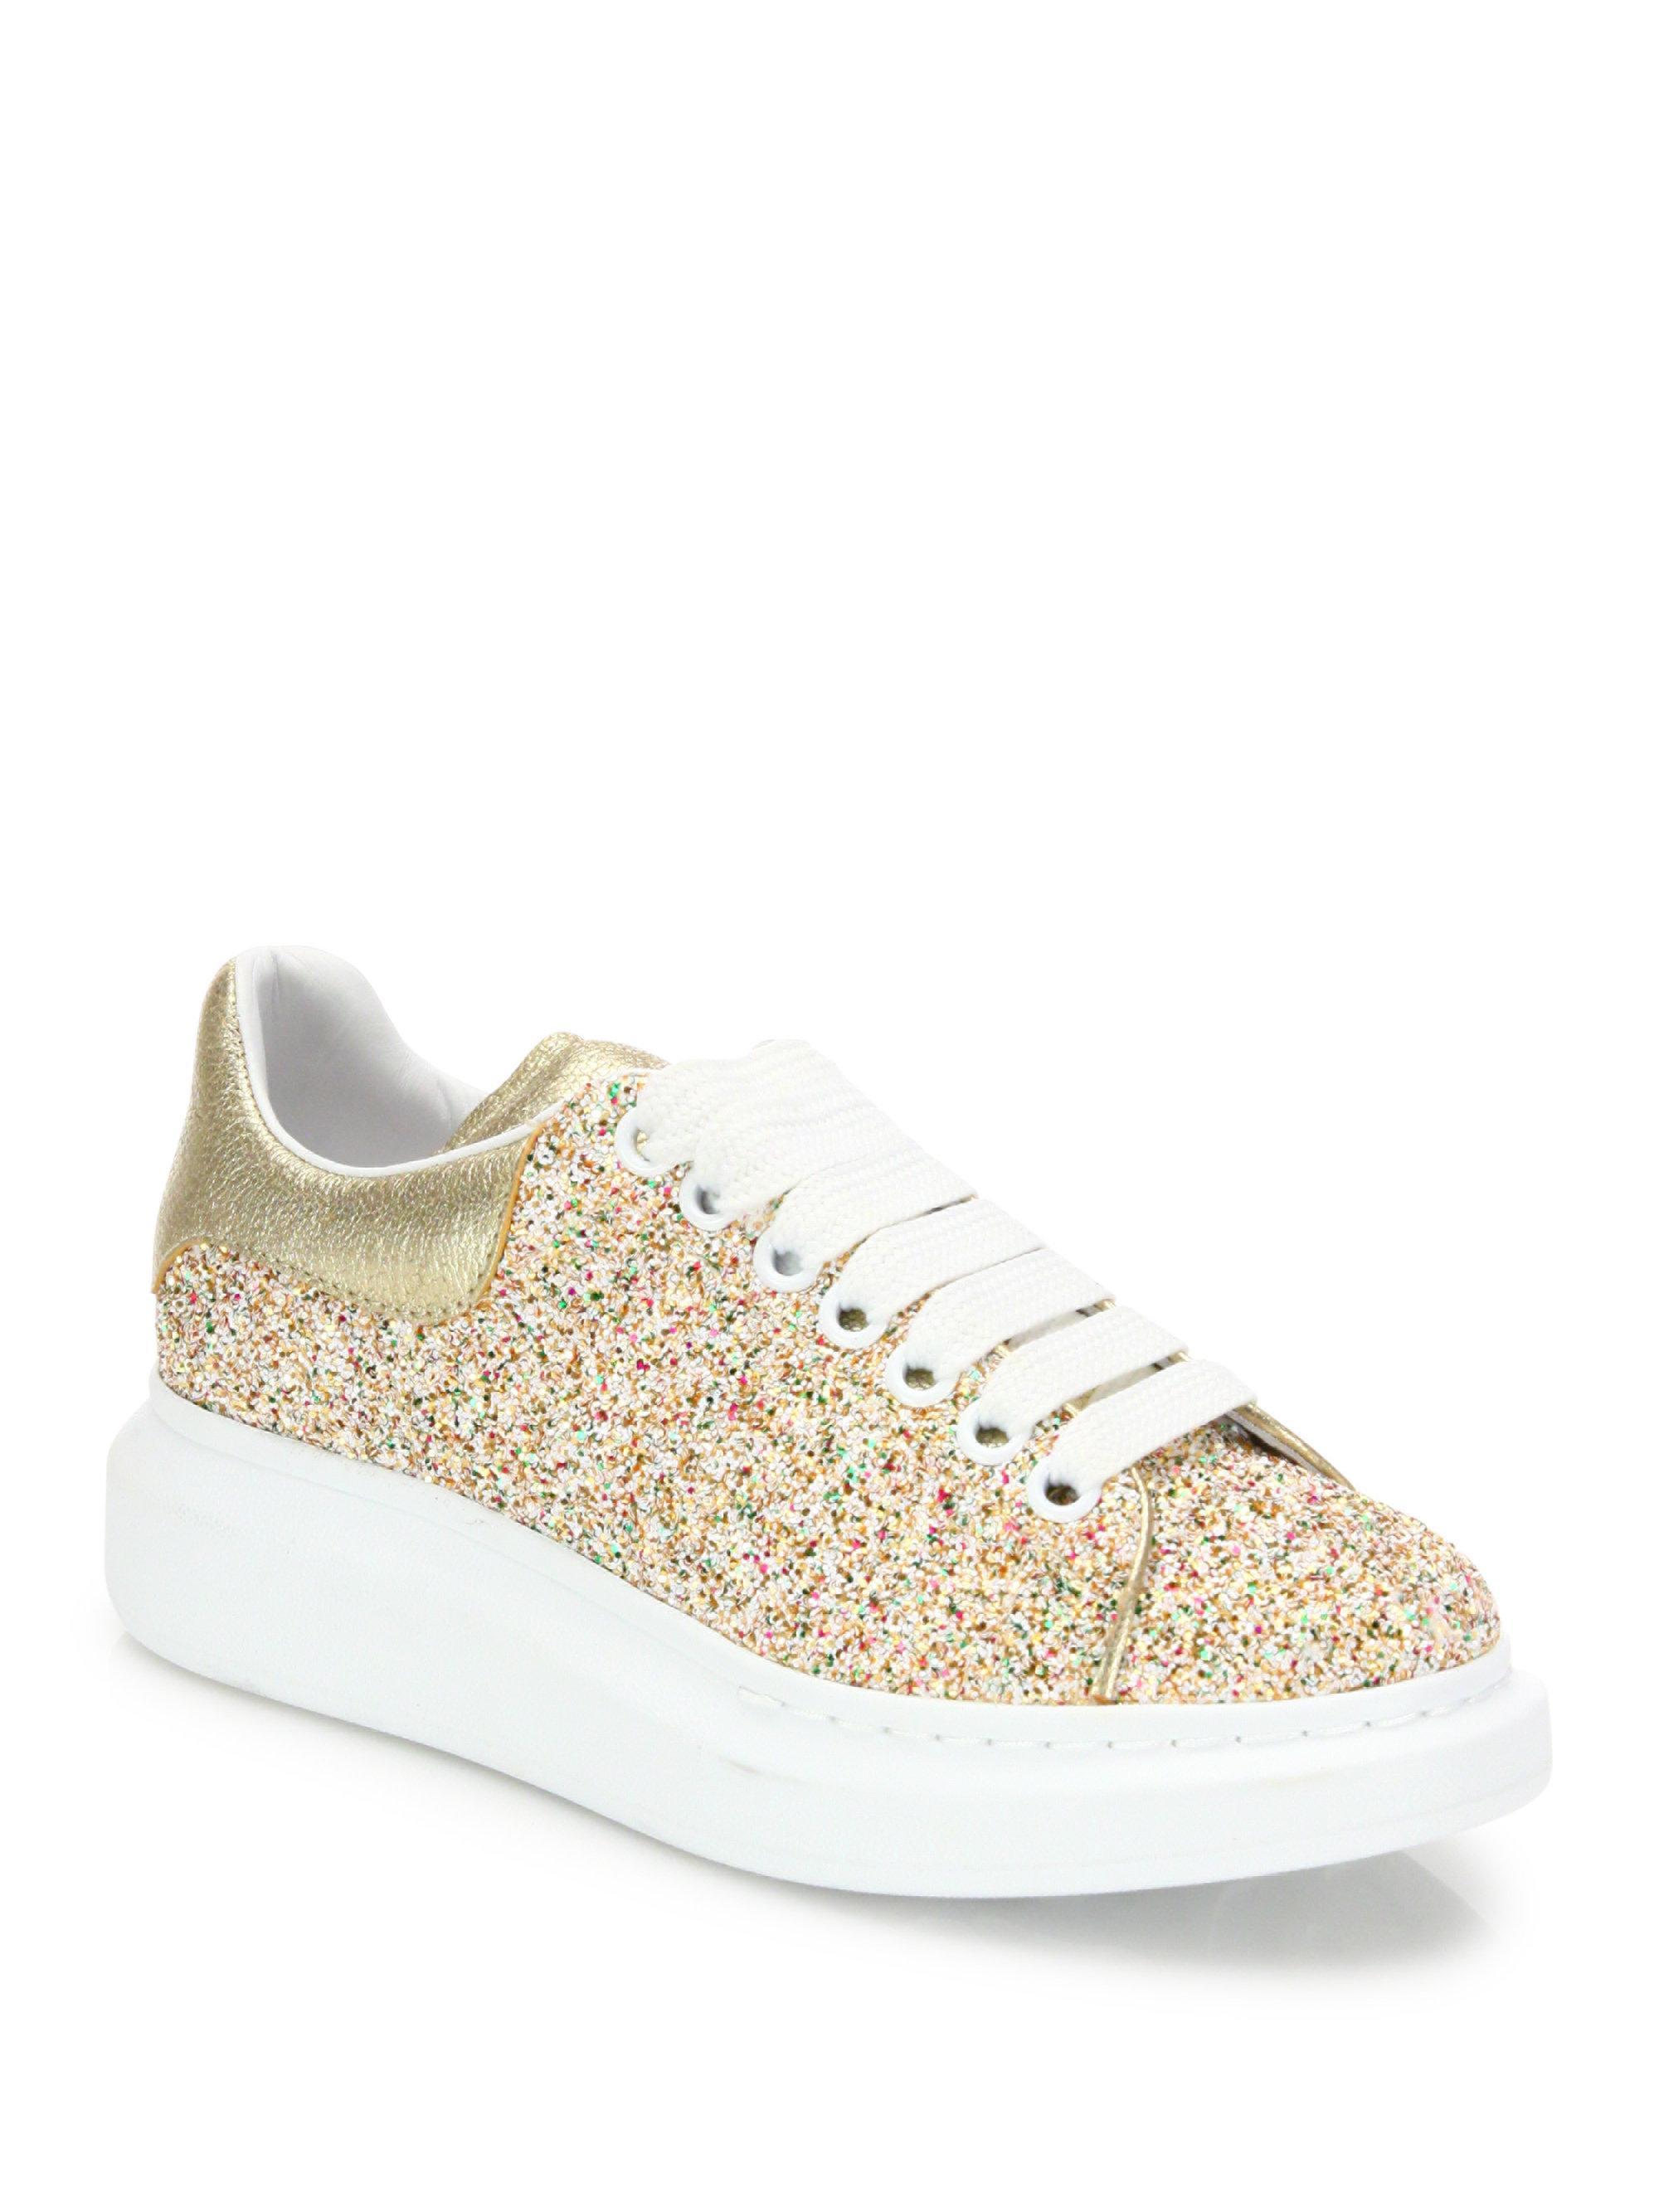 alexander mcqueen gold glitter trainers